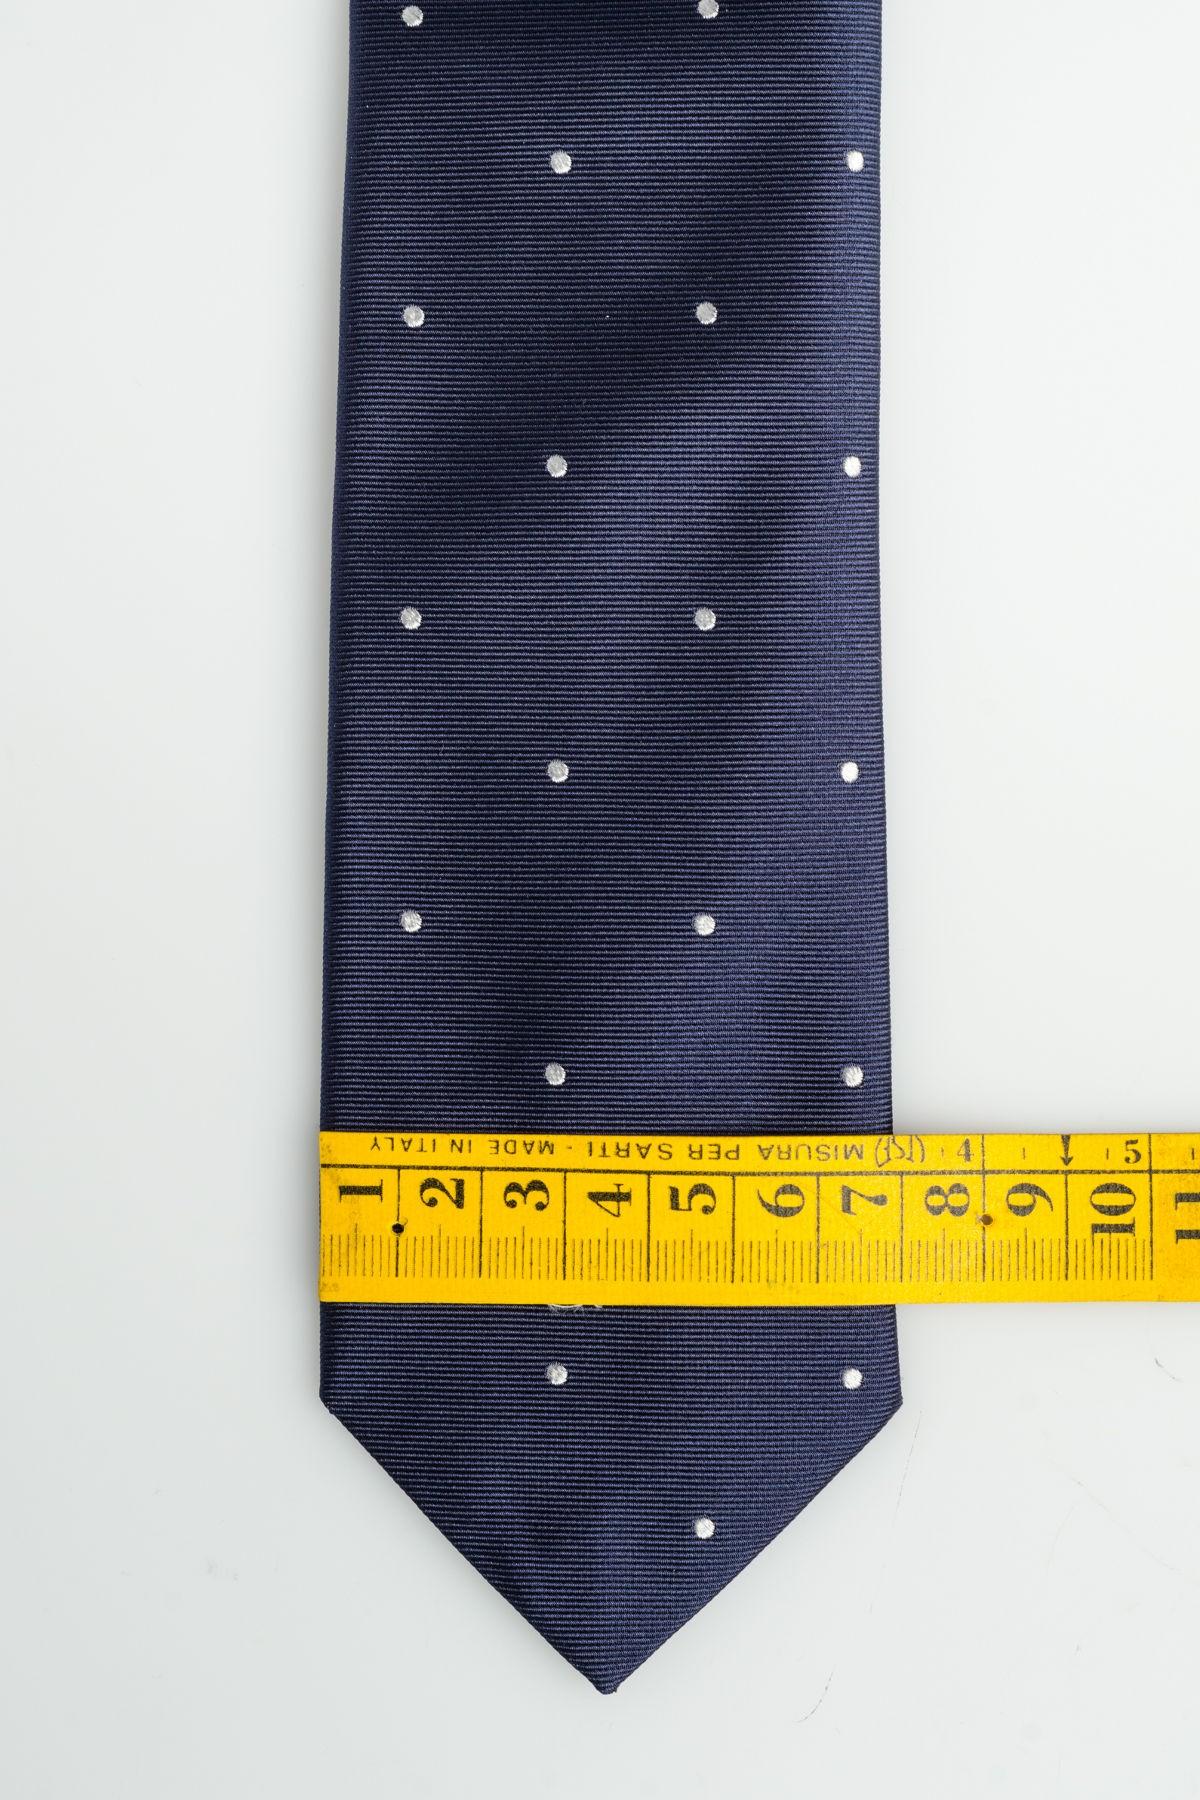 Tie FRANCO BASSI F/W 17-18